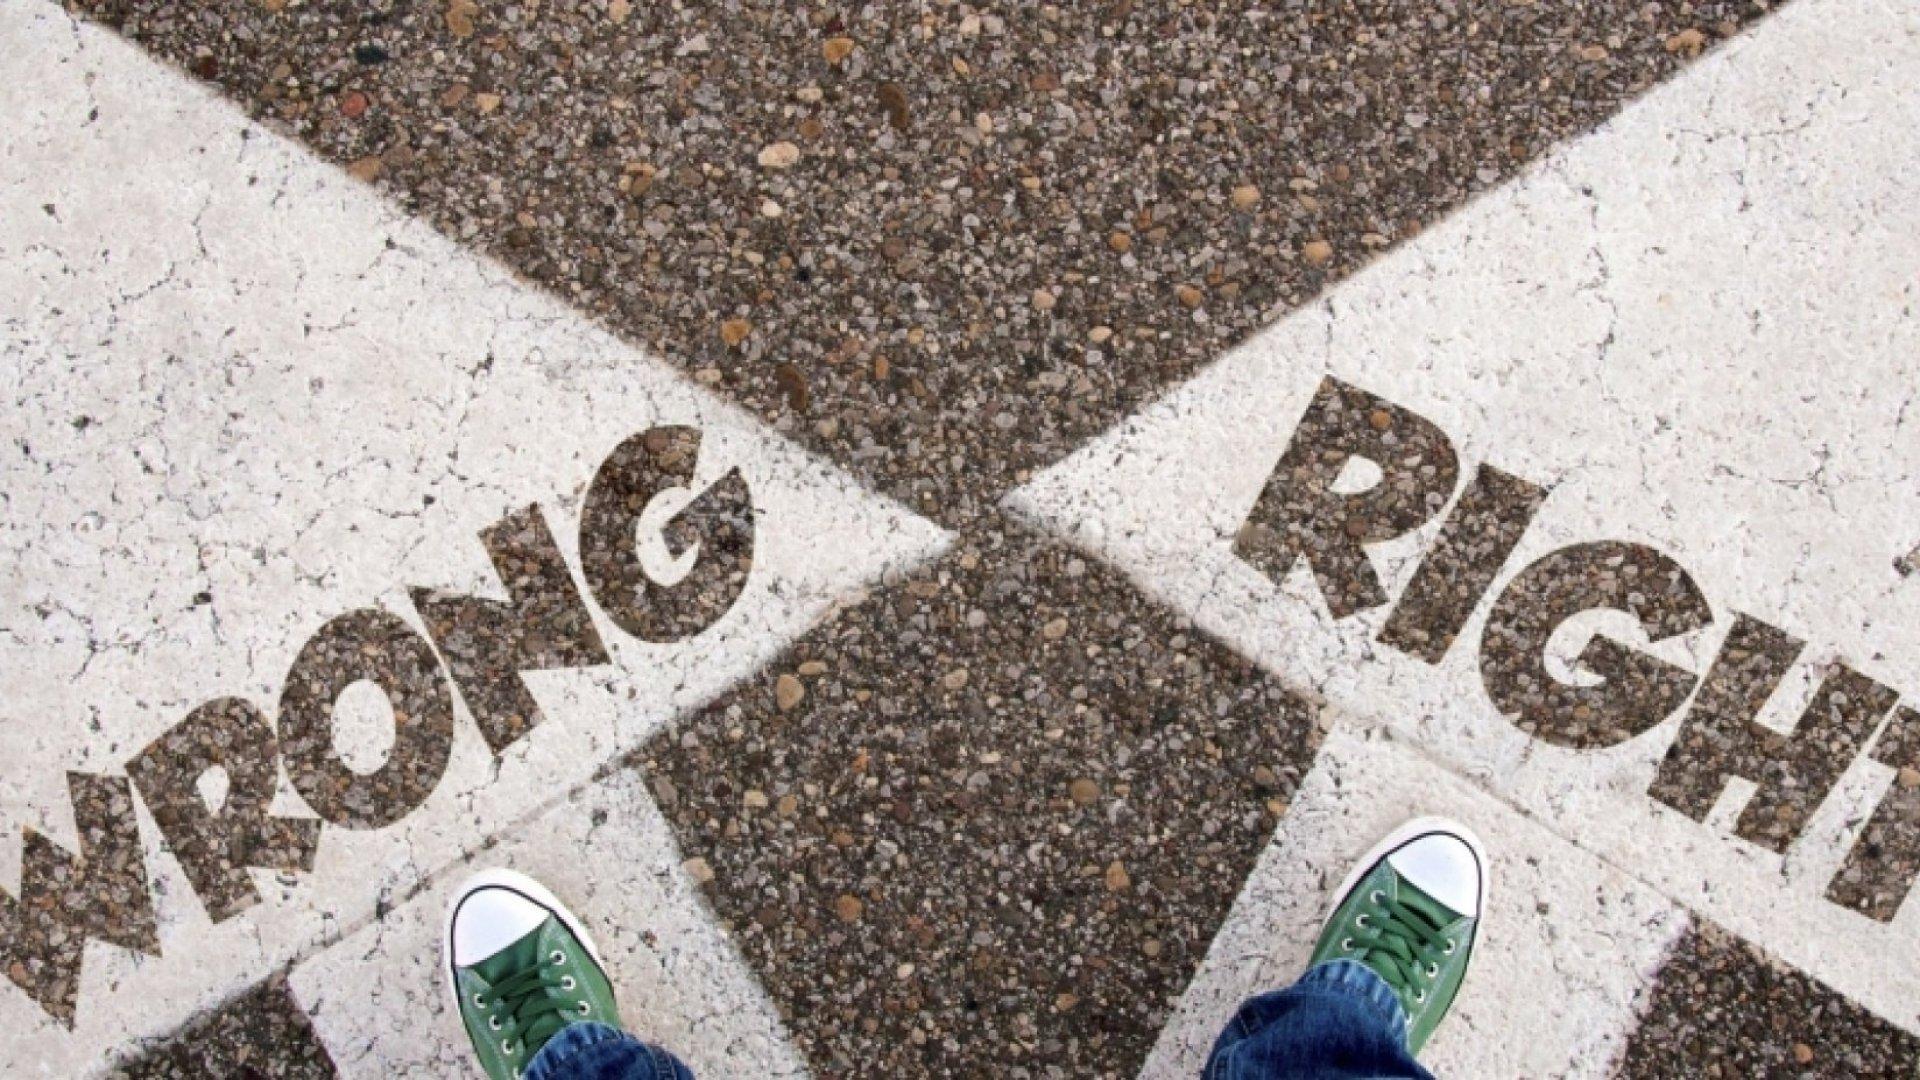 The Importance of Moral Entrepreneurship